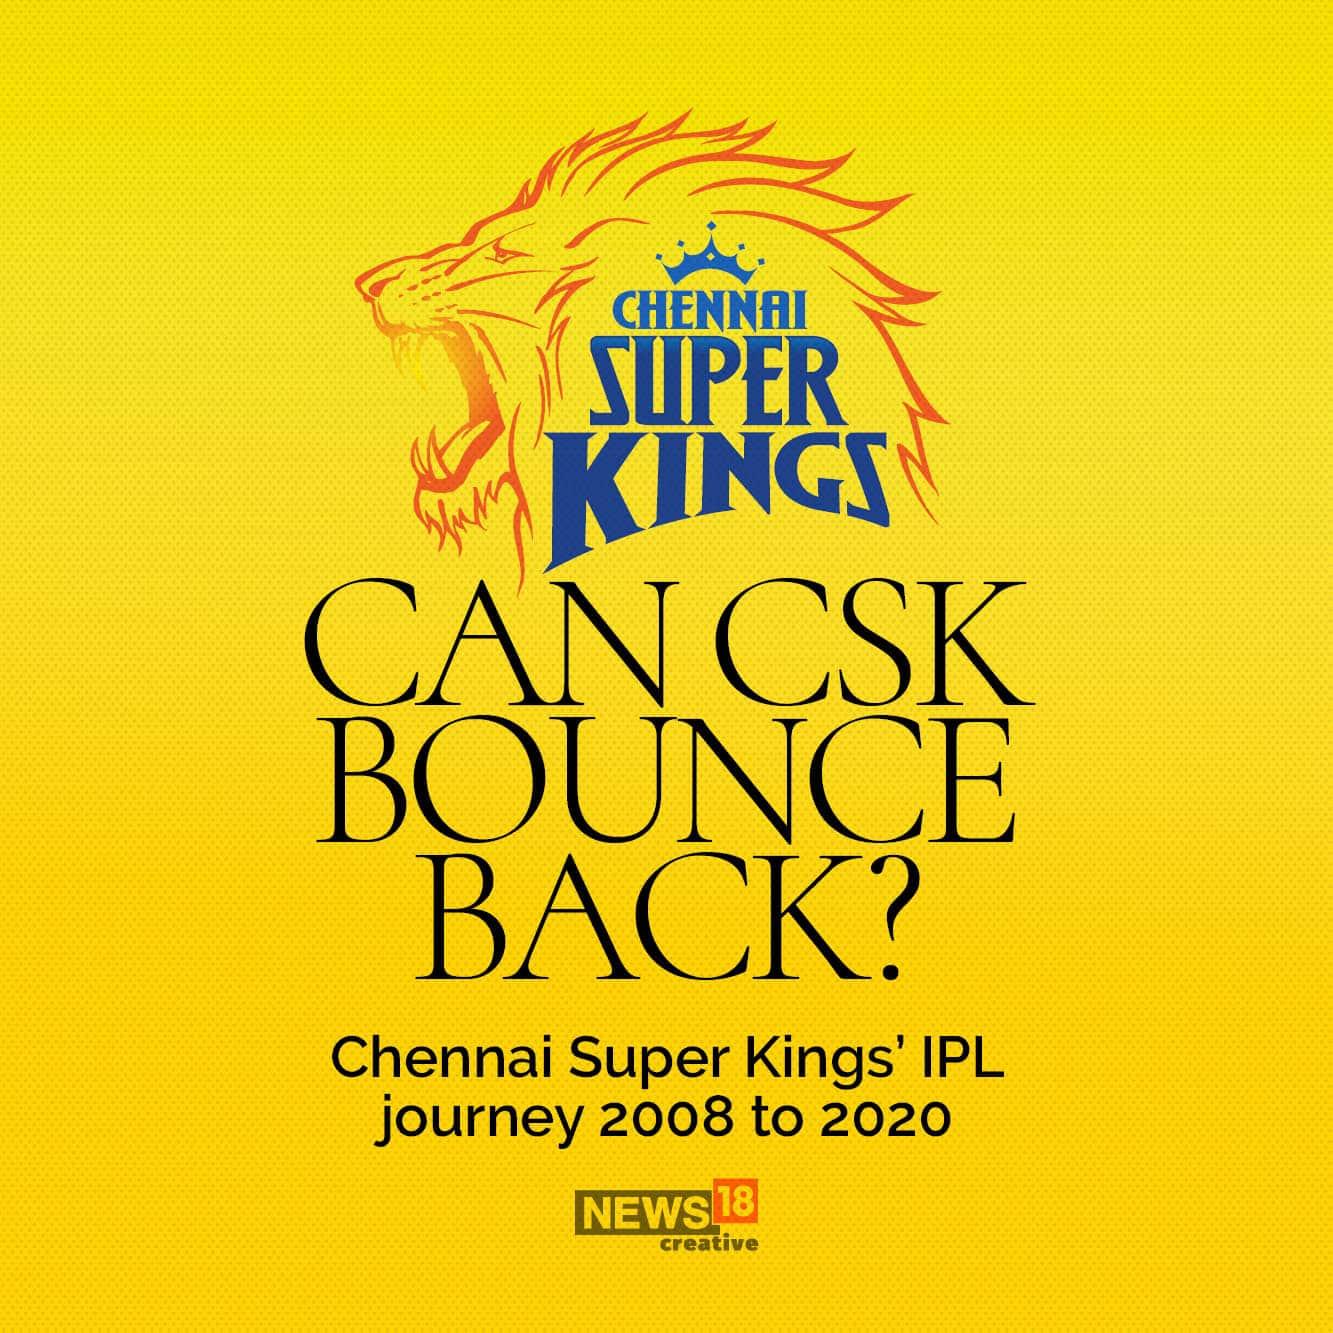 IPL 2020: Can MS Dhoni's Chennai Super Kings bounce back?